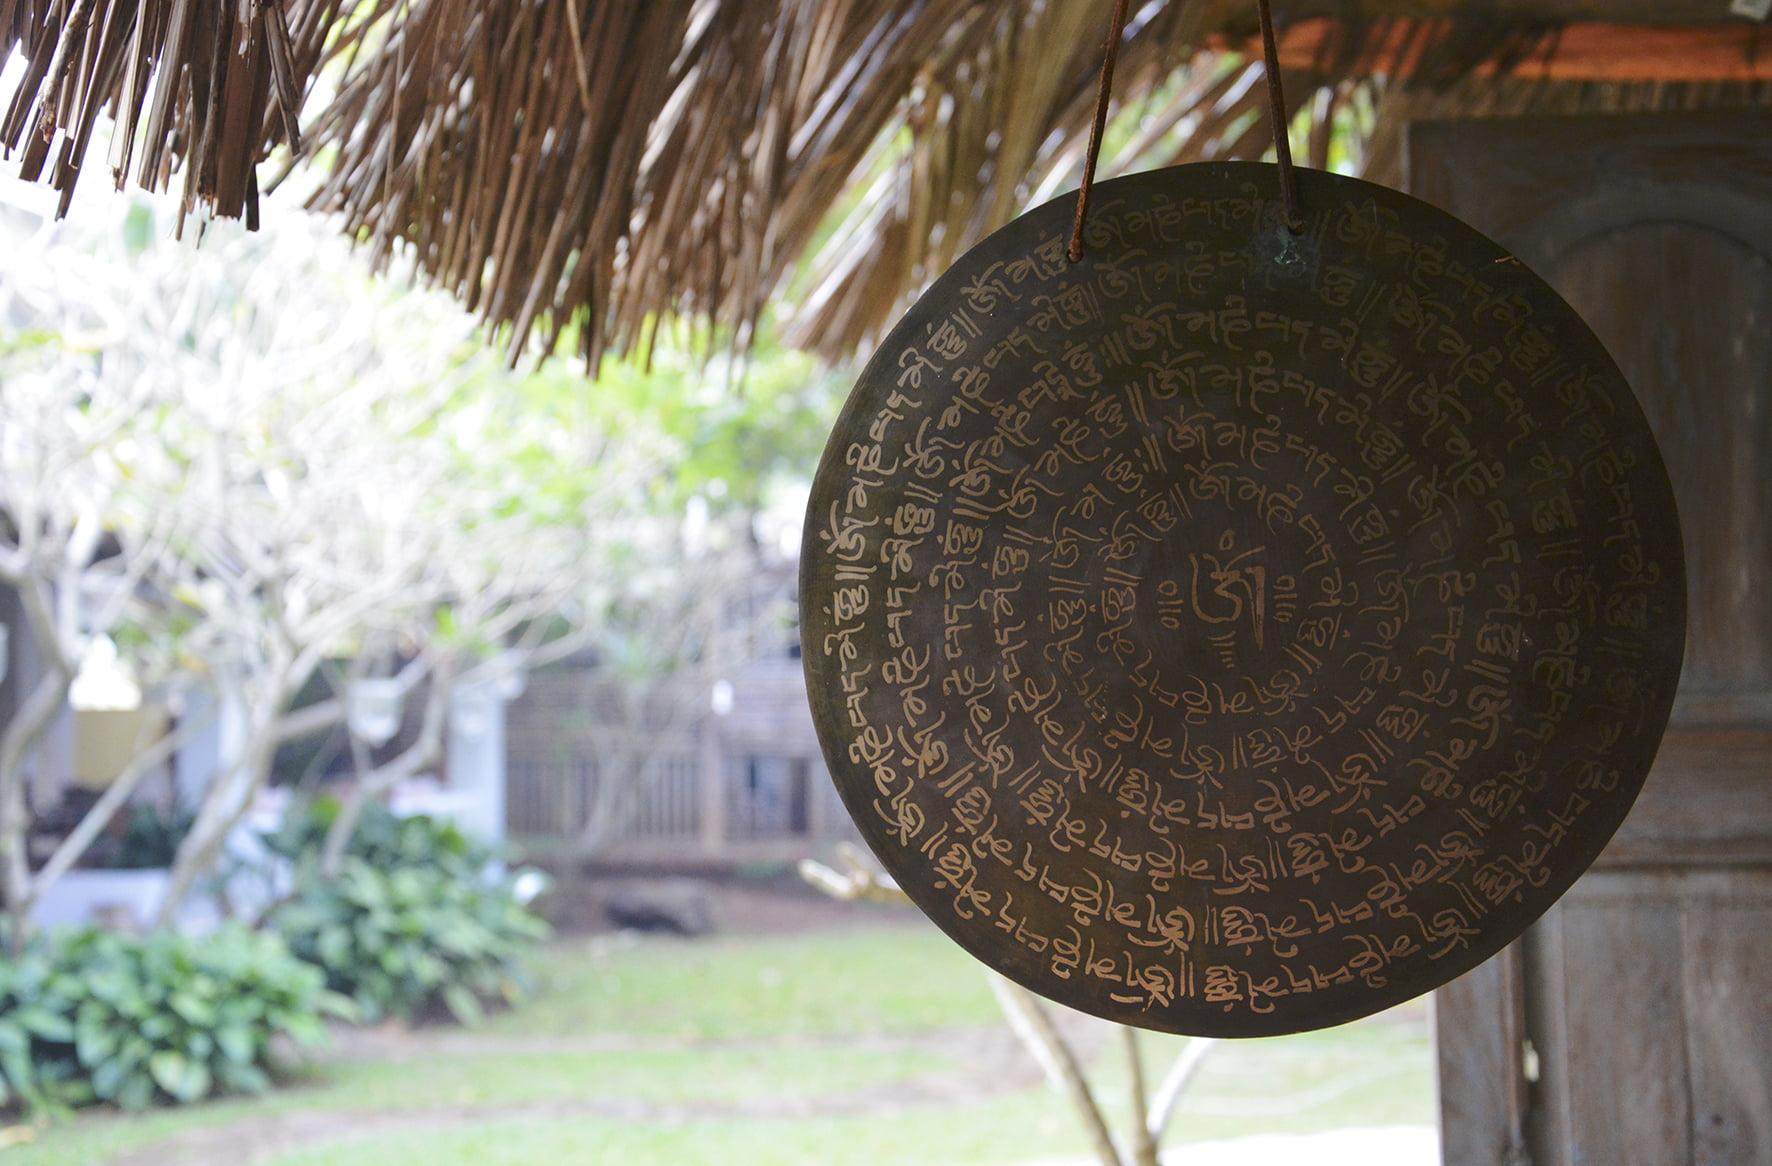 evia yoga solingen gong mit sanskrit symbolen